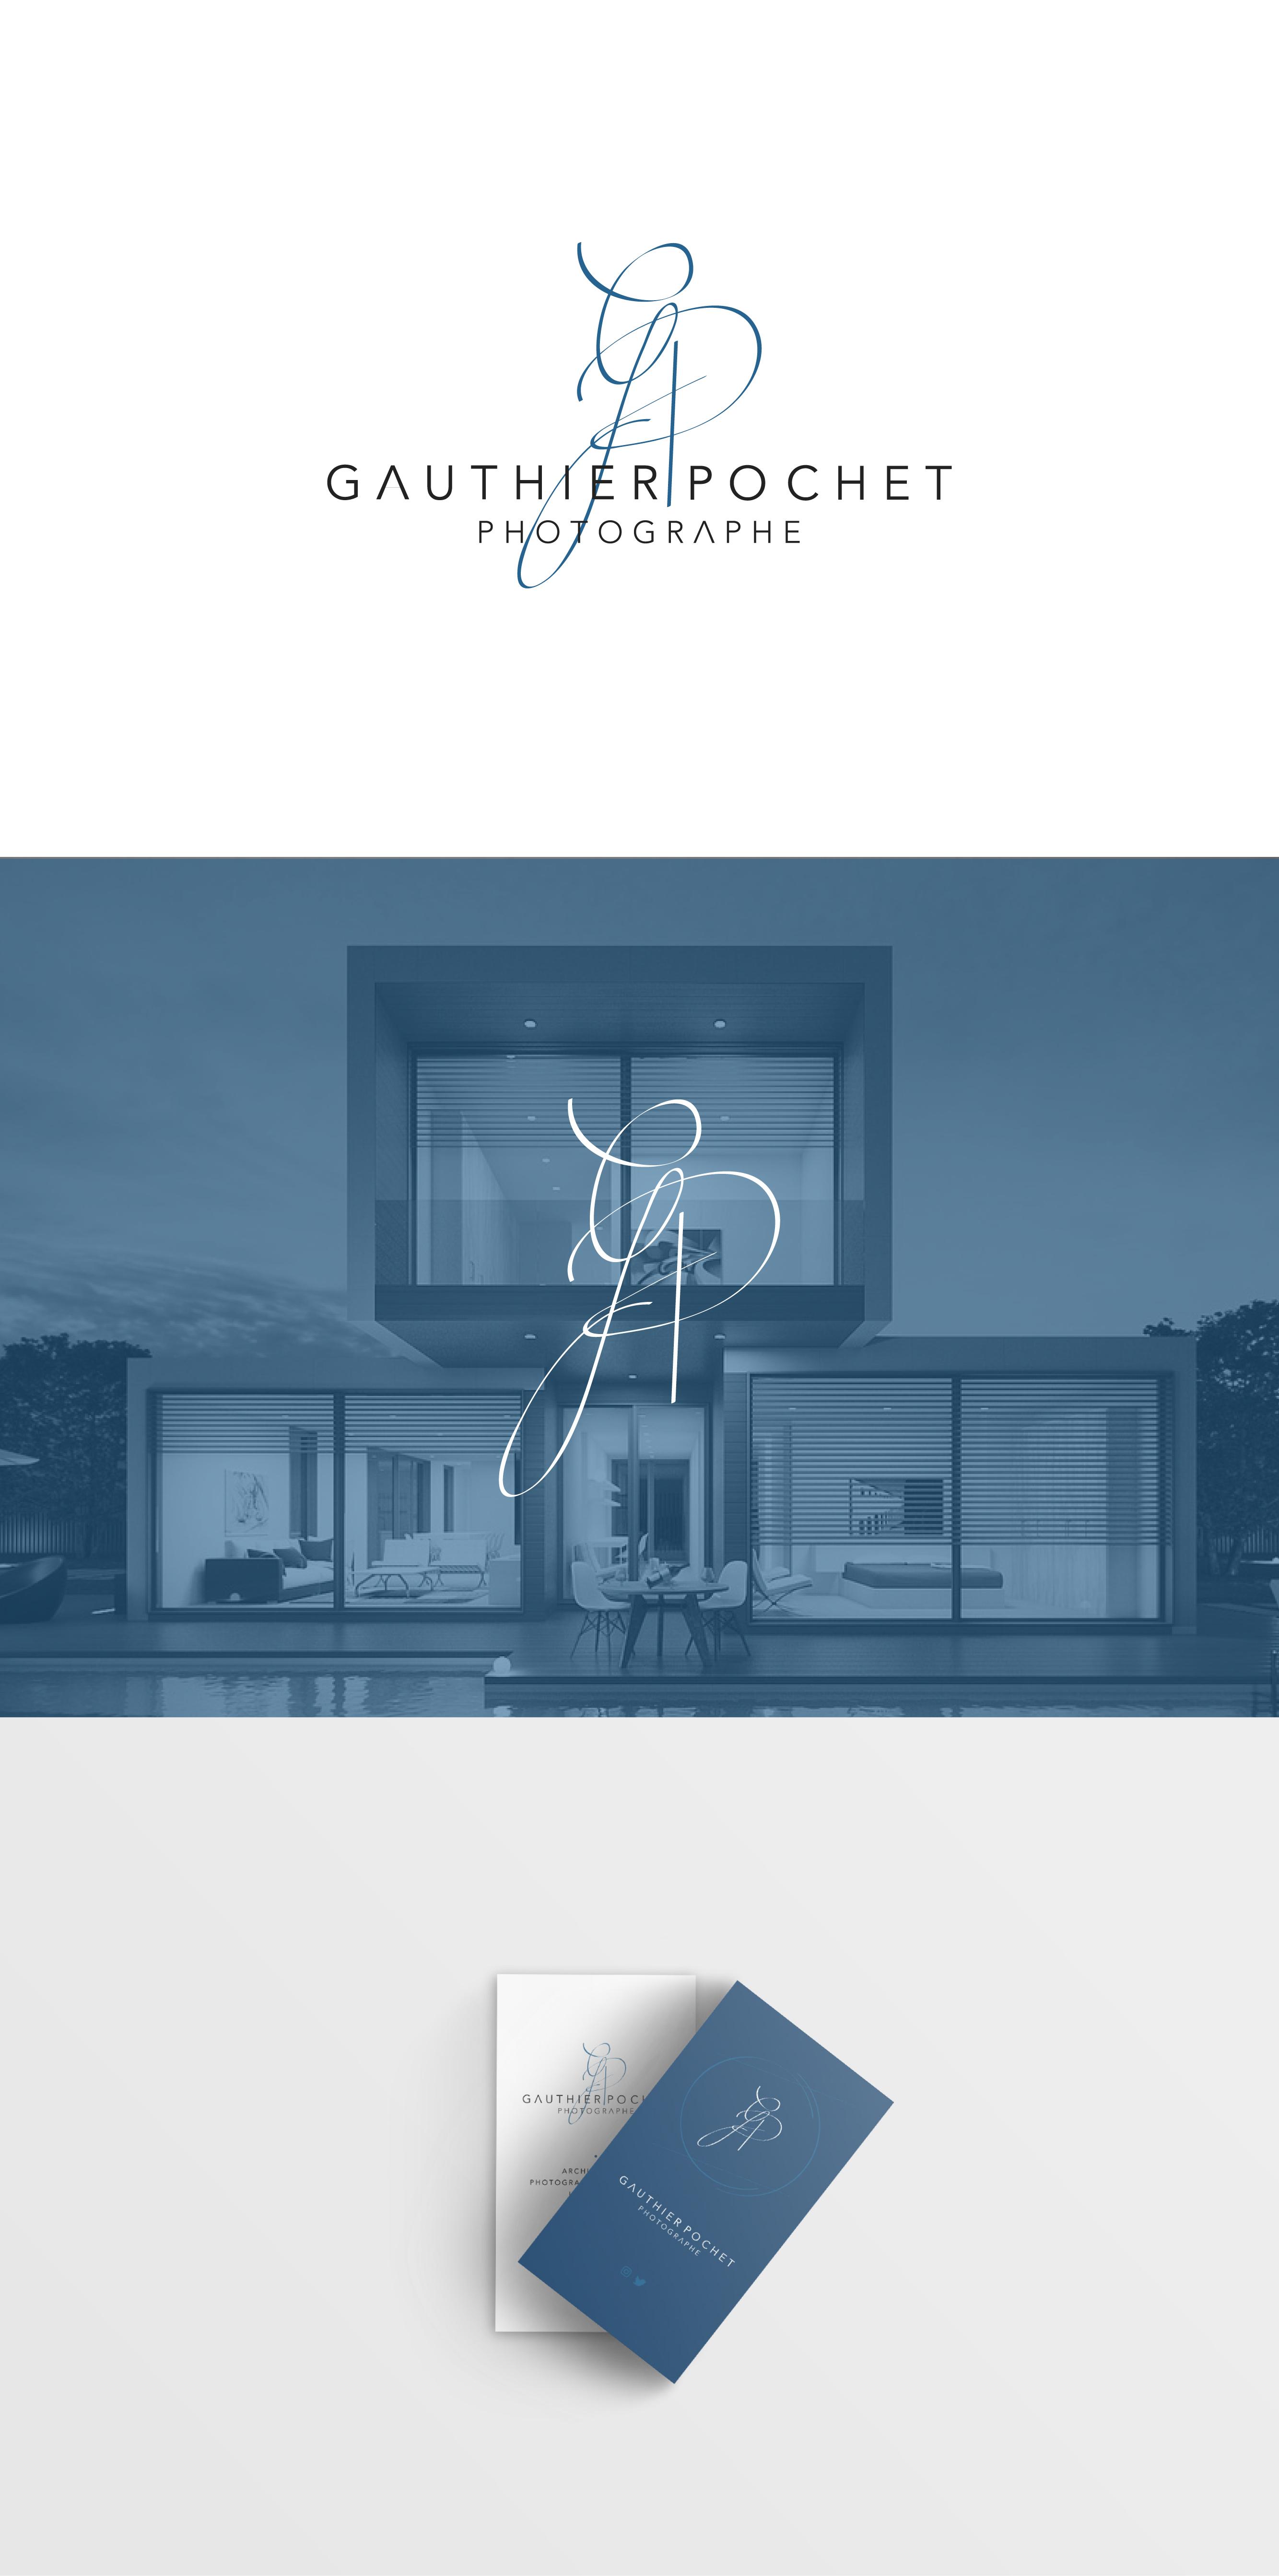 Projet-identité-Gauthier-Pochet-Brand-Design-Julia-Capdebos-01-01.jpg